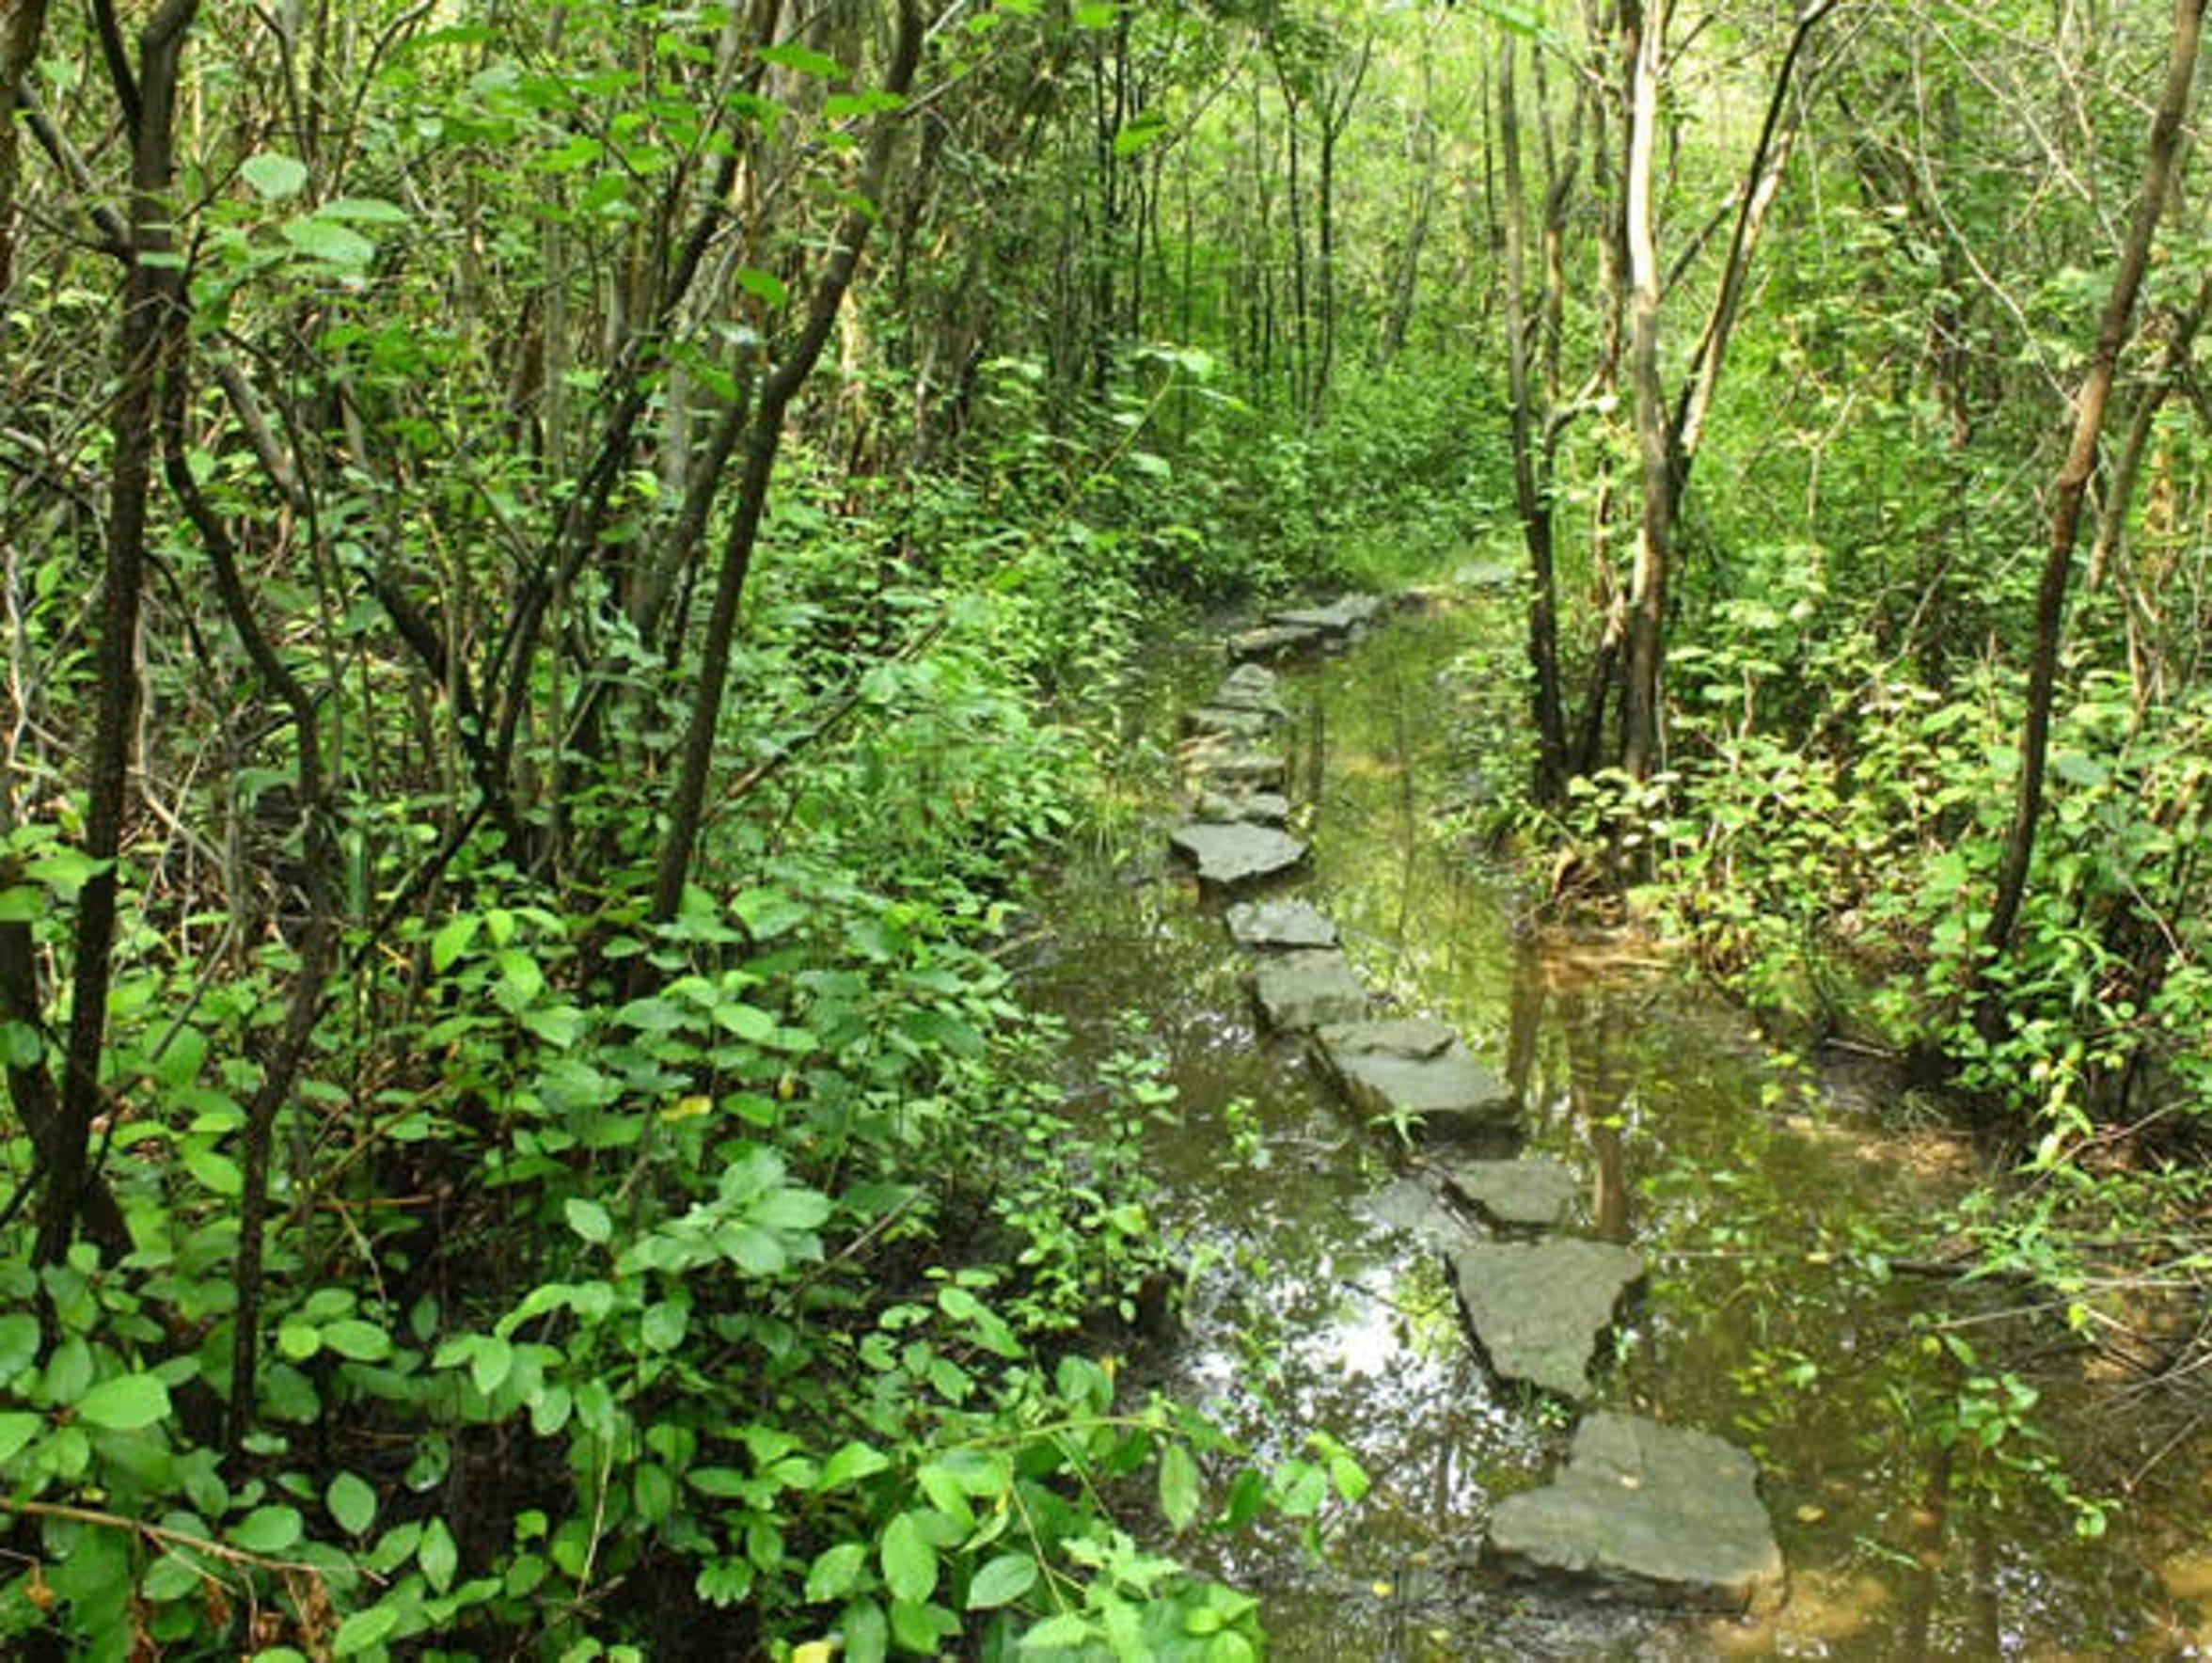 Hipp Brook Preserve is mostly wetland.